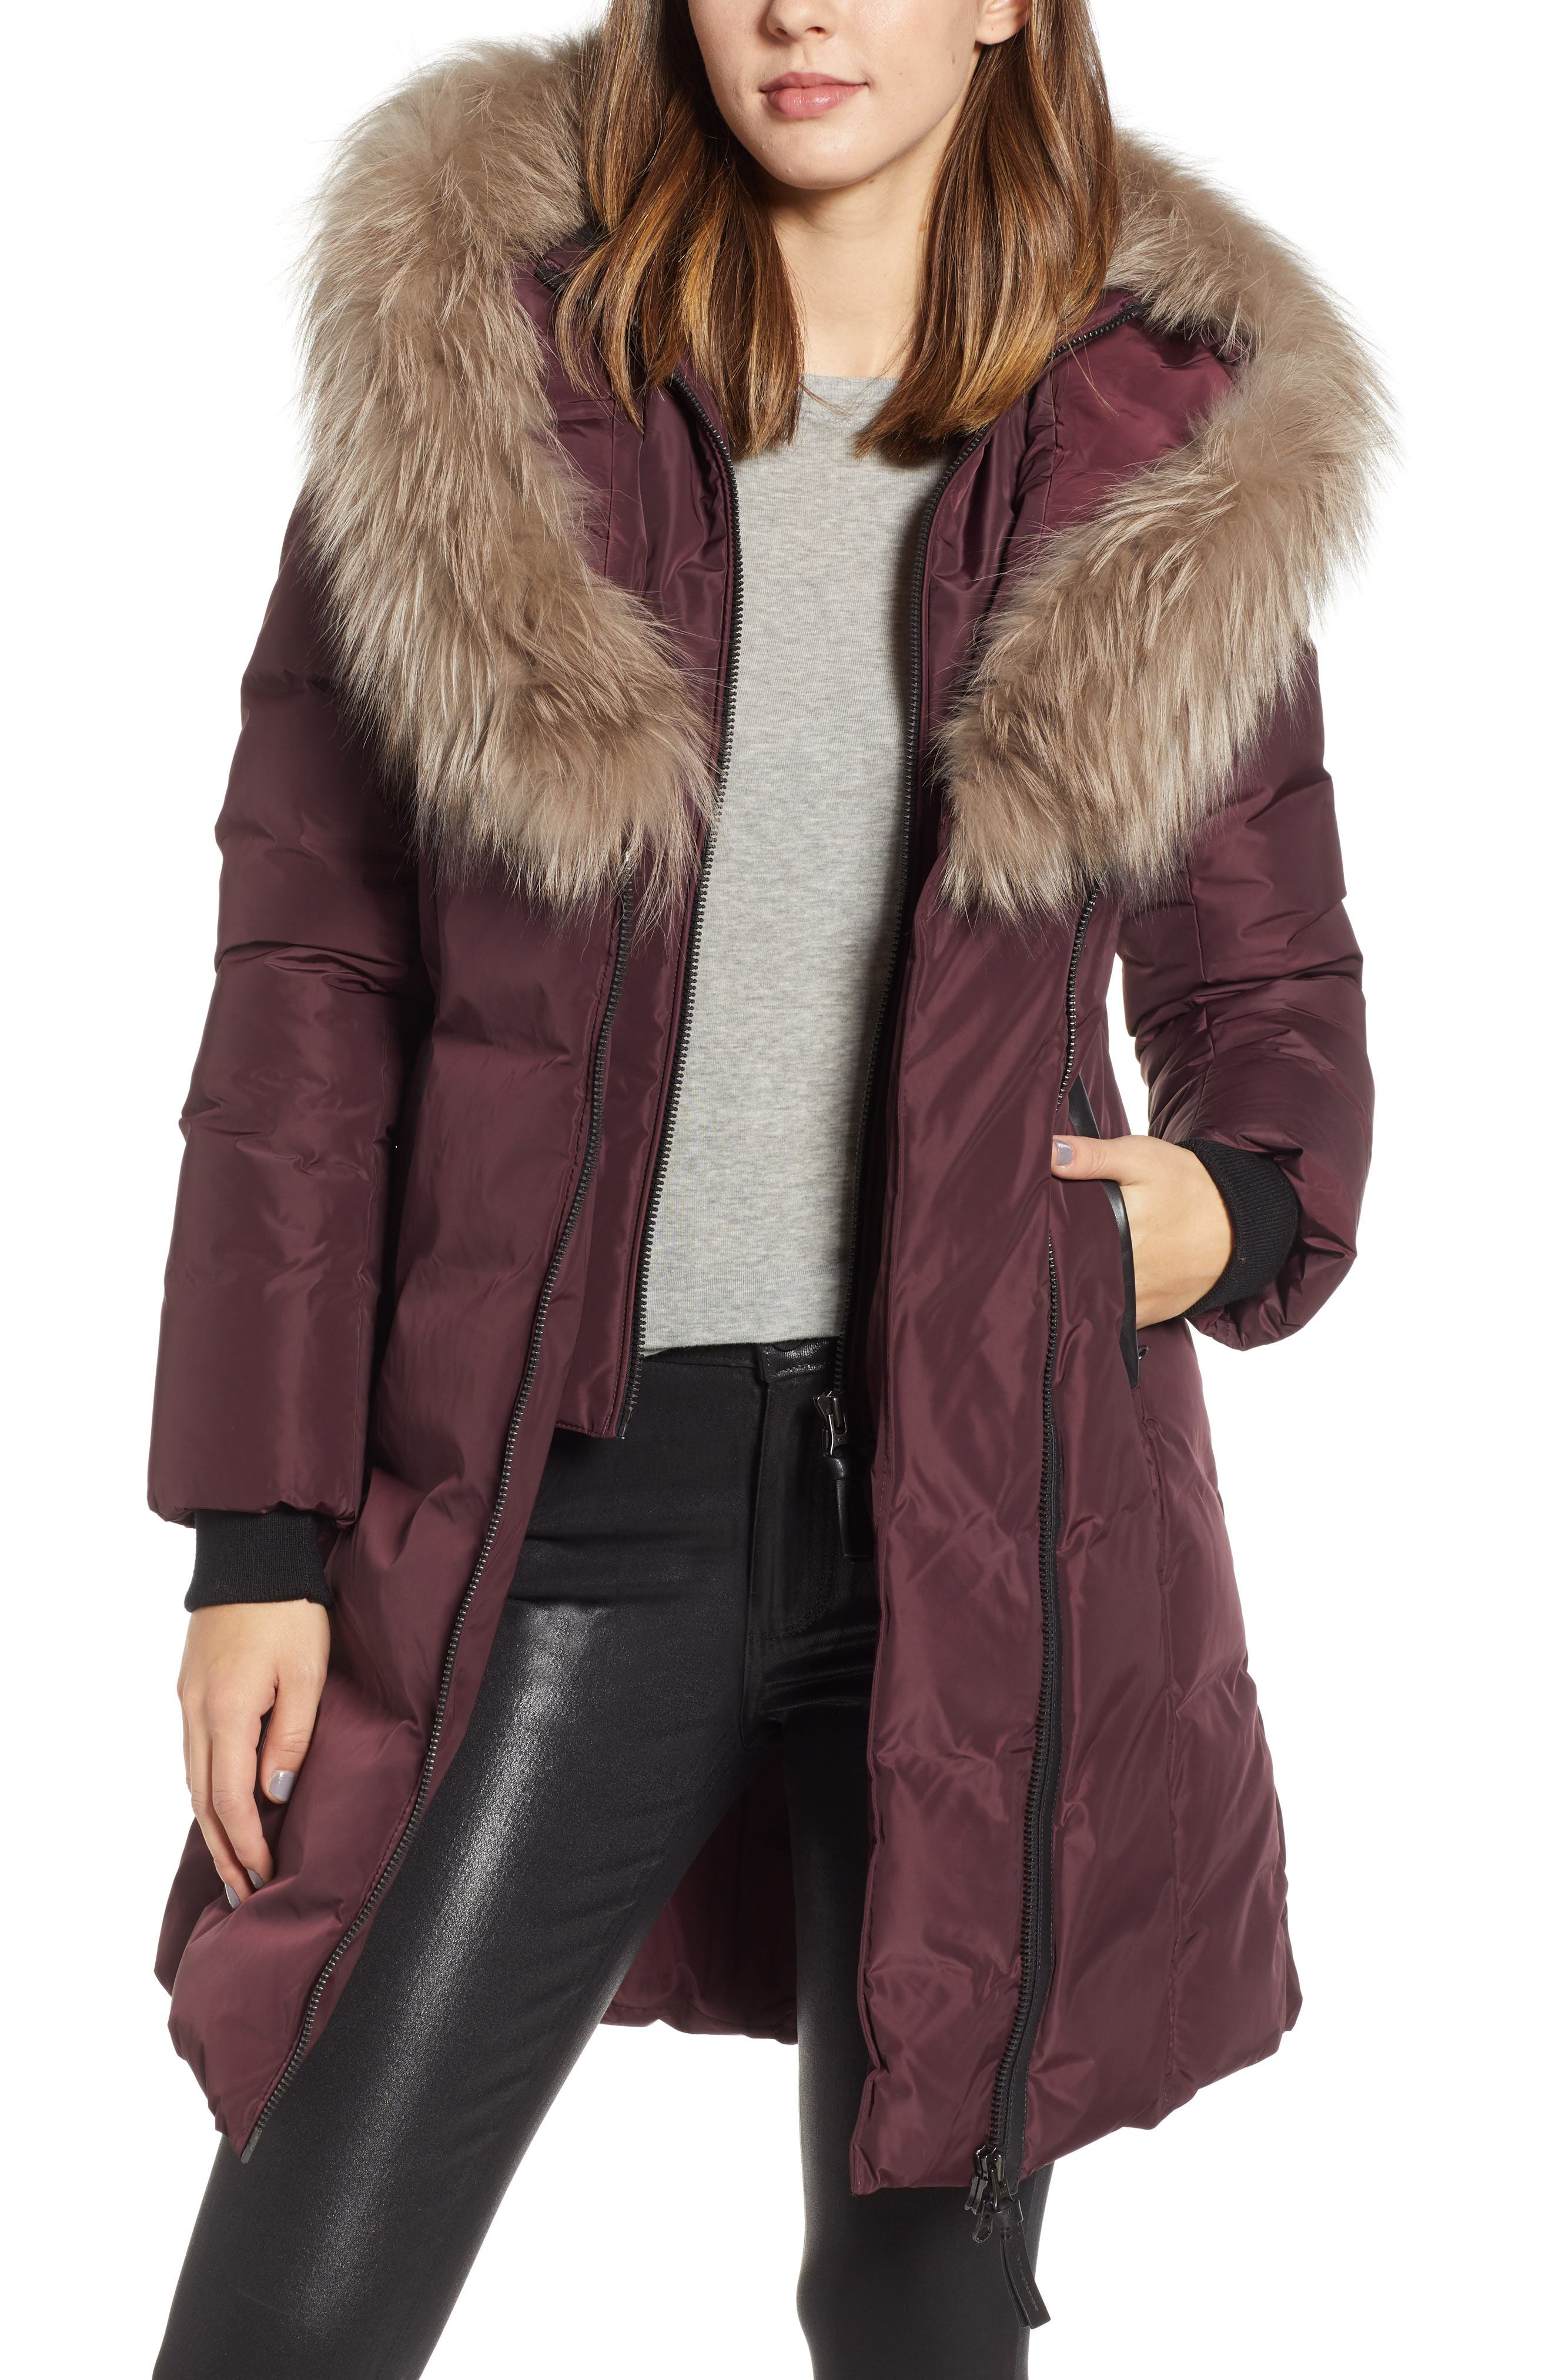 Mackage 800 Fill Power Down Coat With Genuine Fox Fur Trim, Burgundy